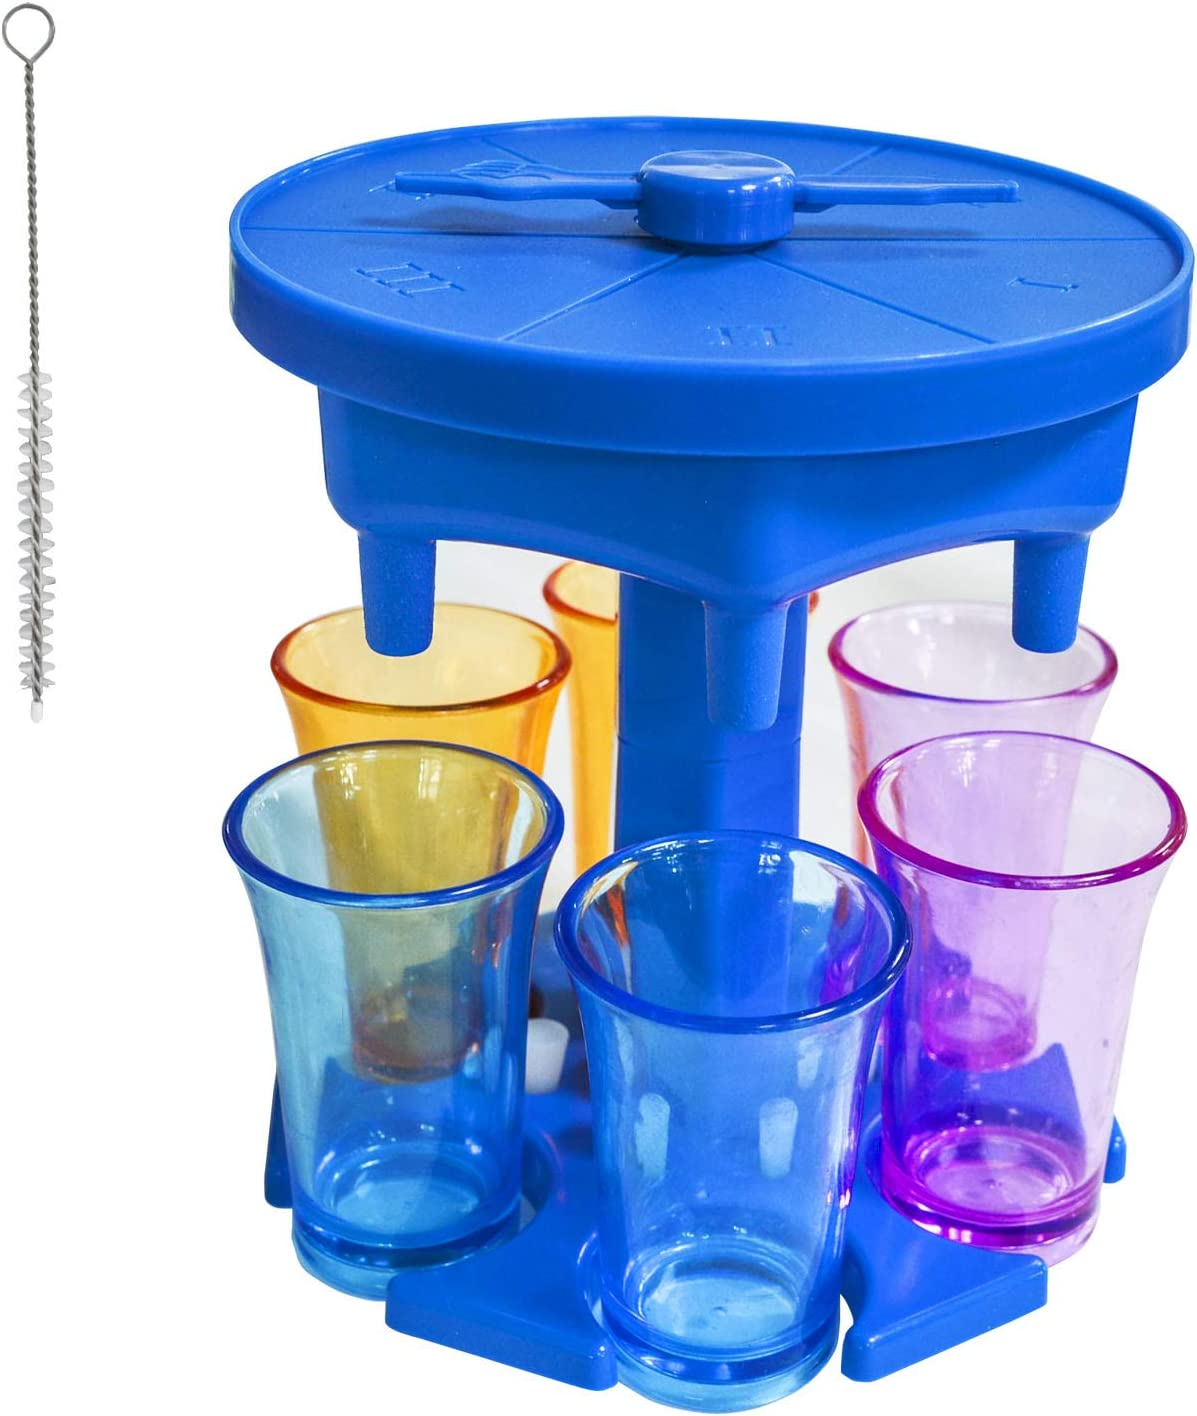 6 Shot Glass Dispenser and Holder, Shot Buddy Dispenser, Drink Beverage Dispenser for Party, Wine Liquid Dispenser, Shot Pourer Caddy Liqour Bottle Dispenser for Bar, with Game Turntable (Blue)